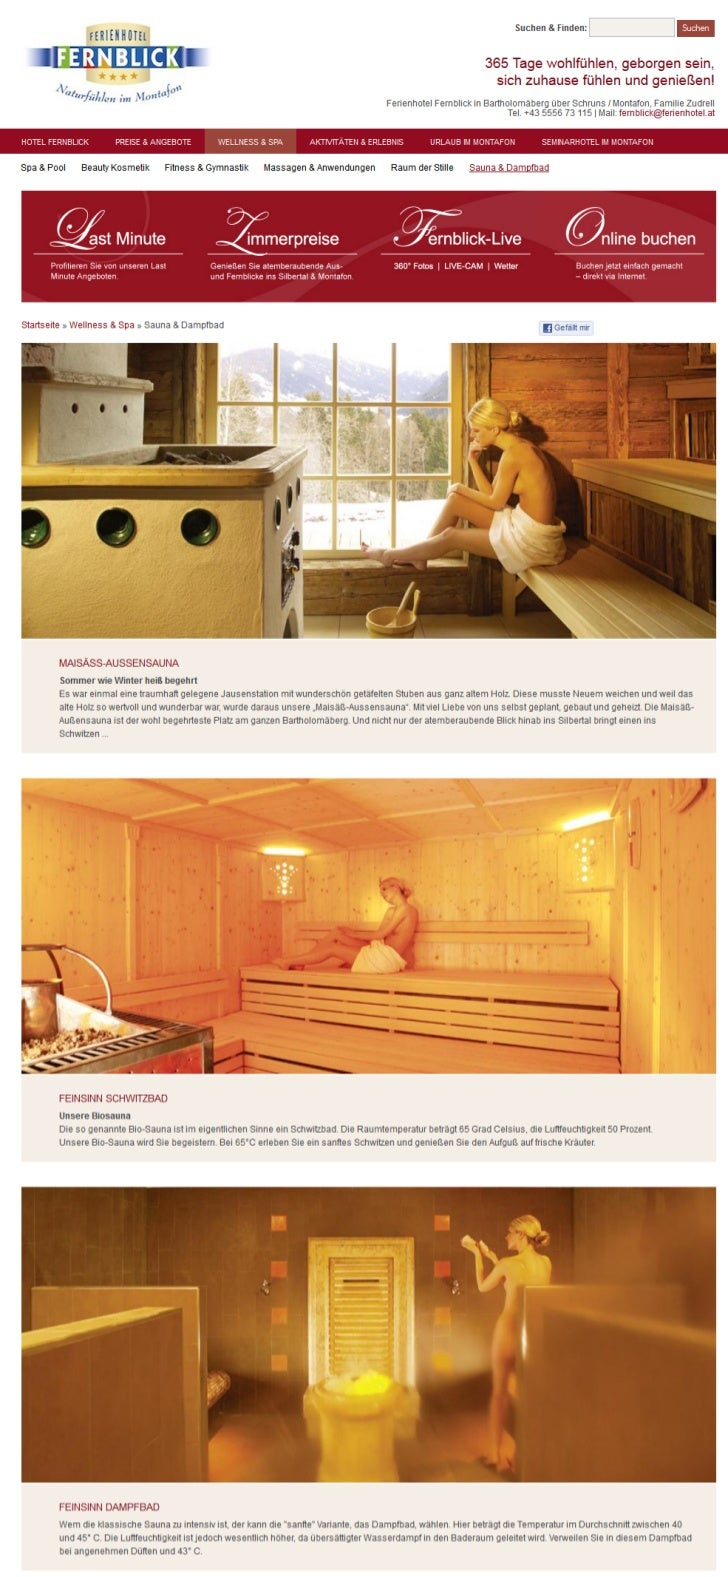 Sauna & Relaxen im Hotel Fernblick